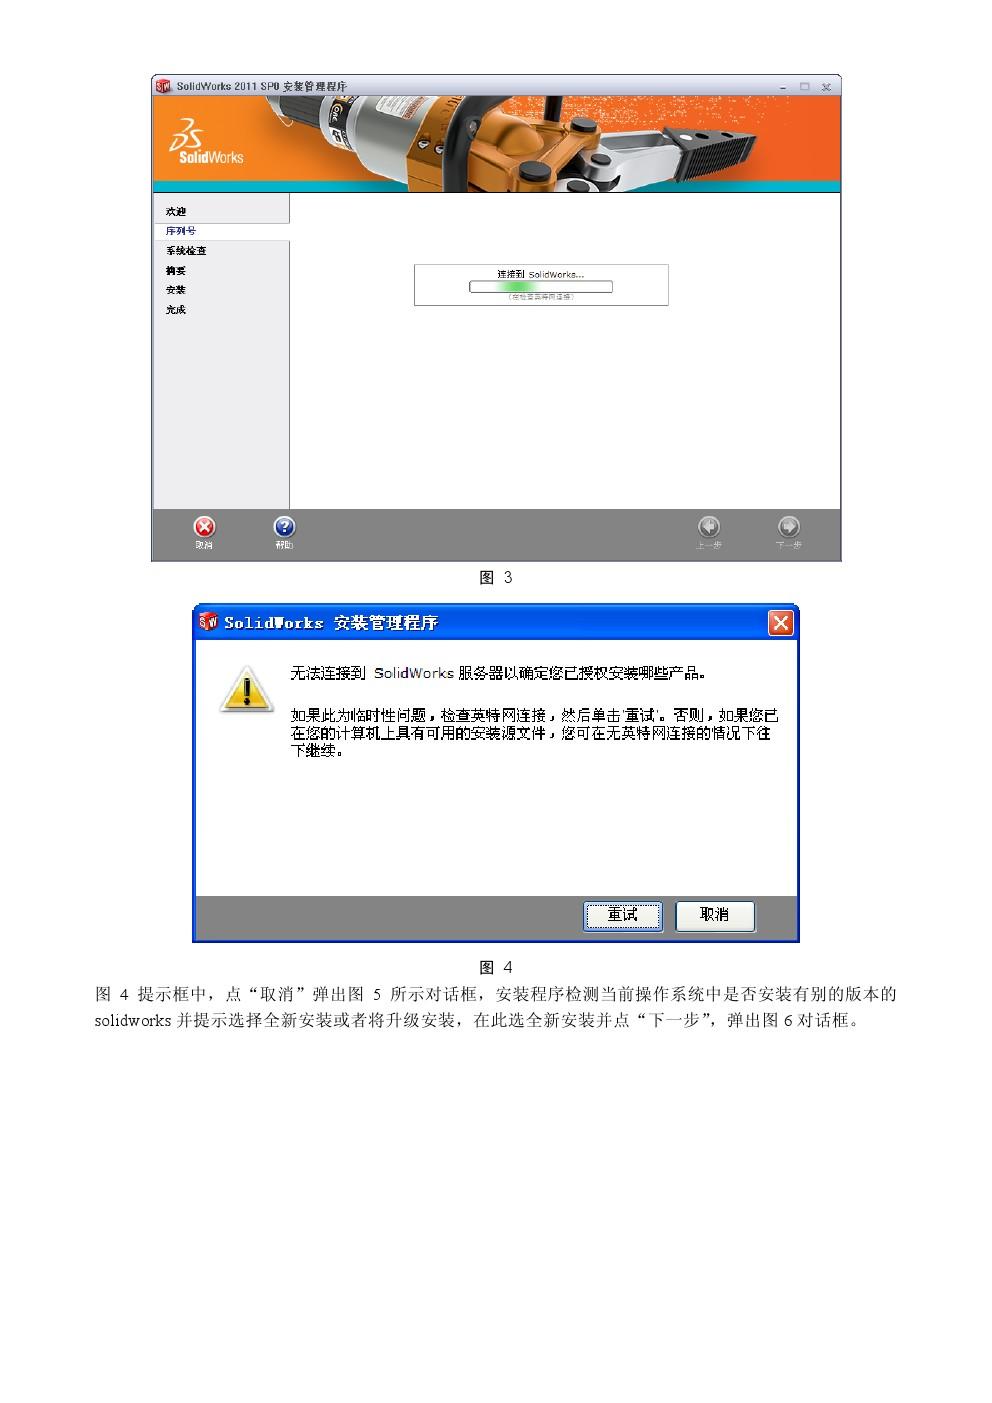 solidworks2011 安装方法 安装教程